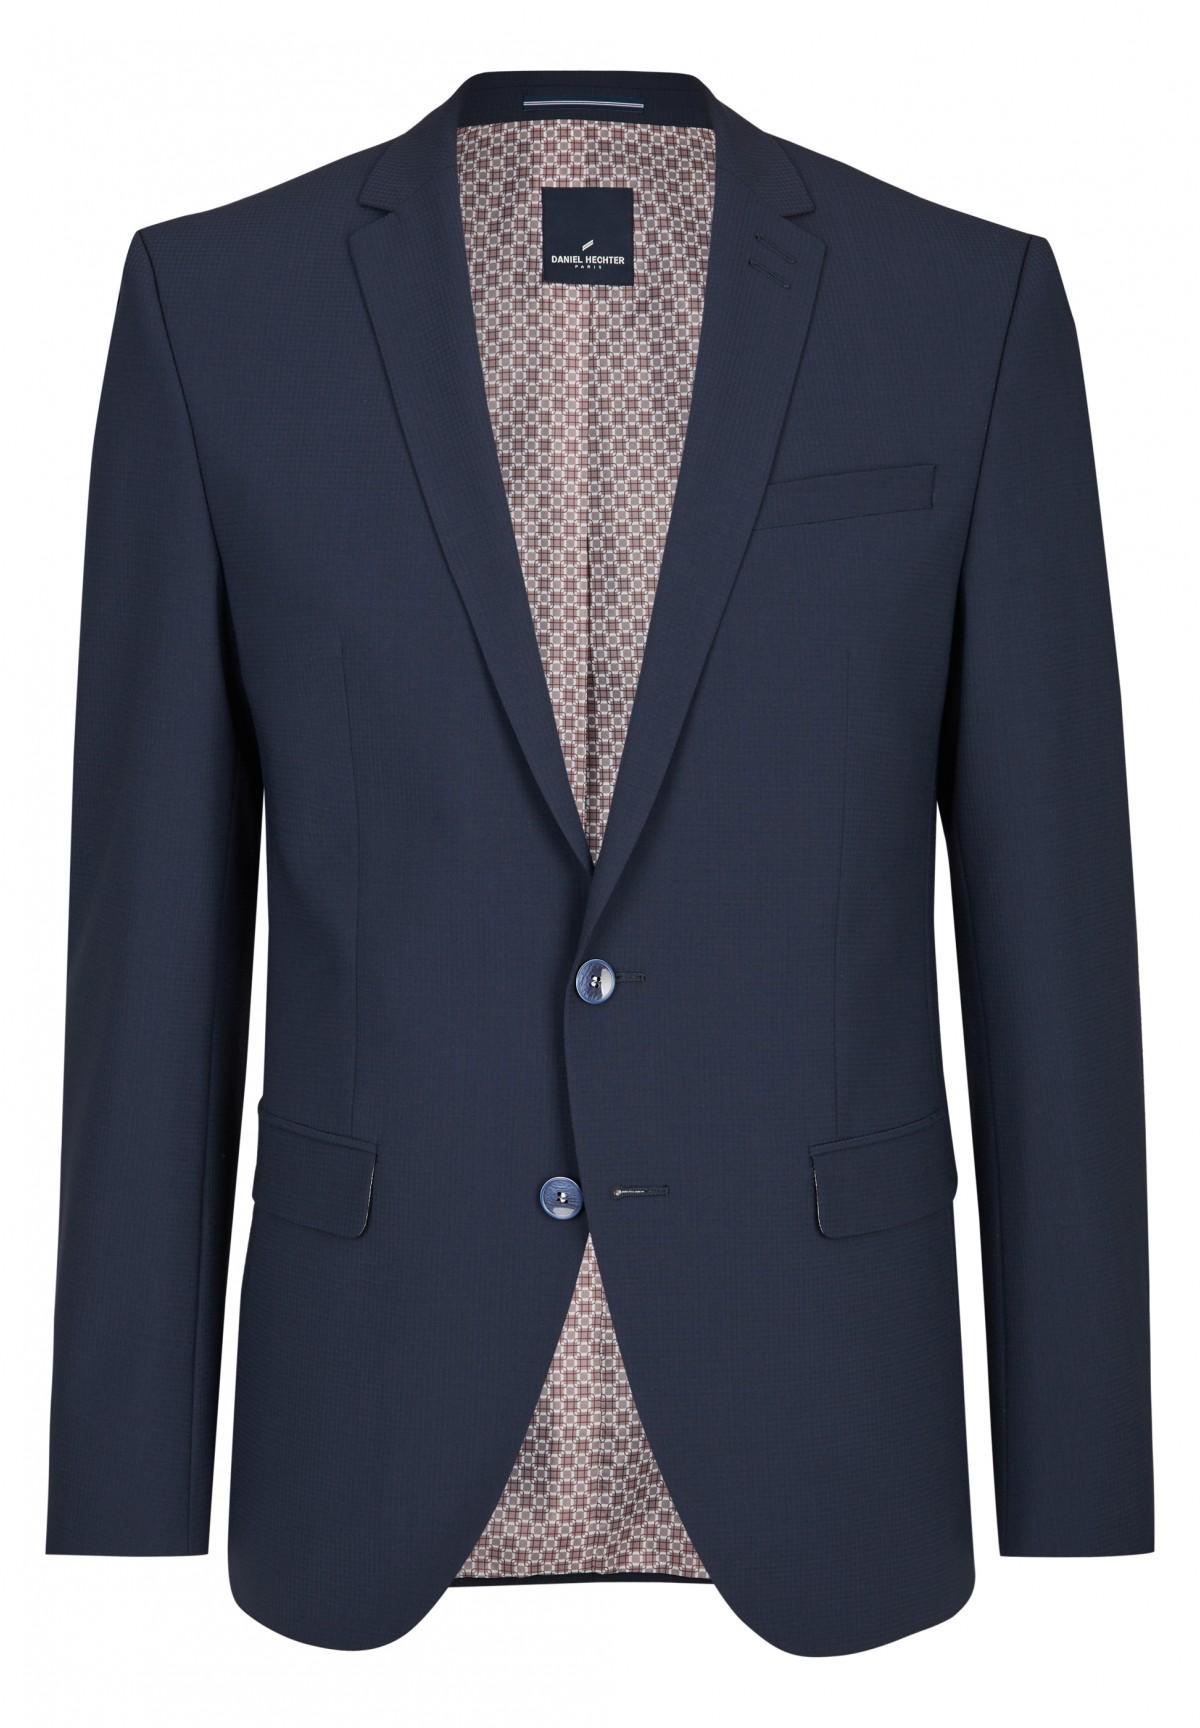 Sehr leichter City Anzug / SUIT NEW